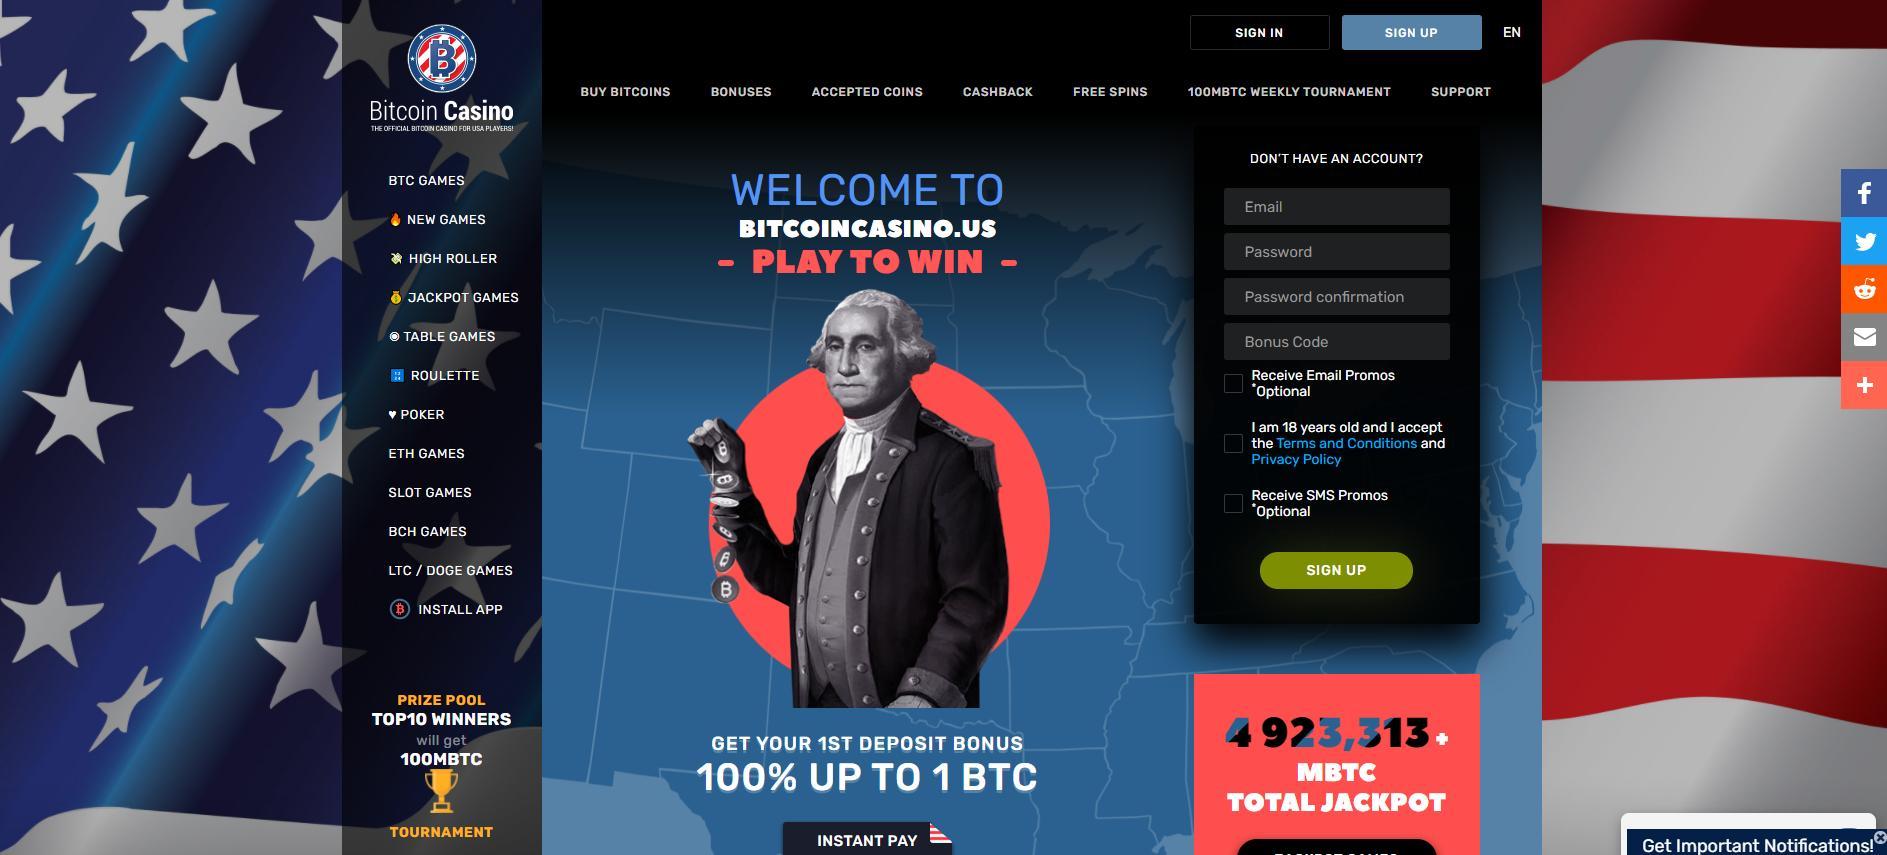 bicoincasino.us homepage